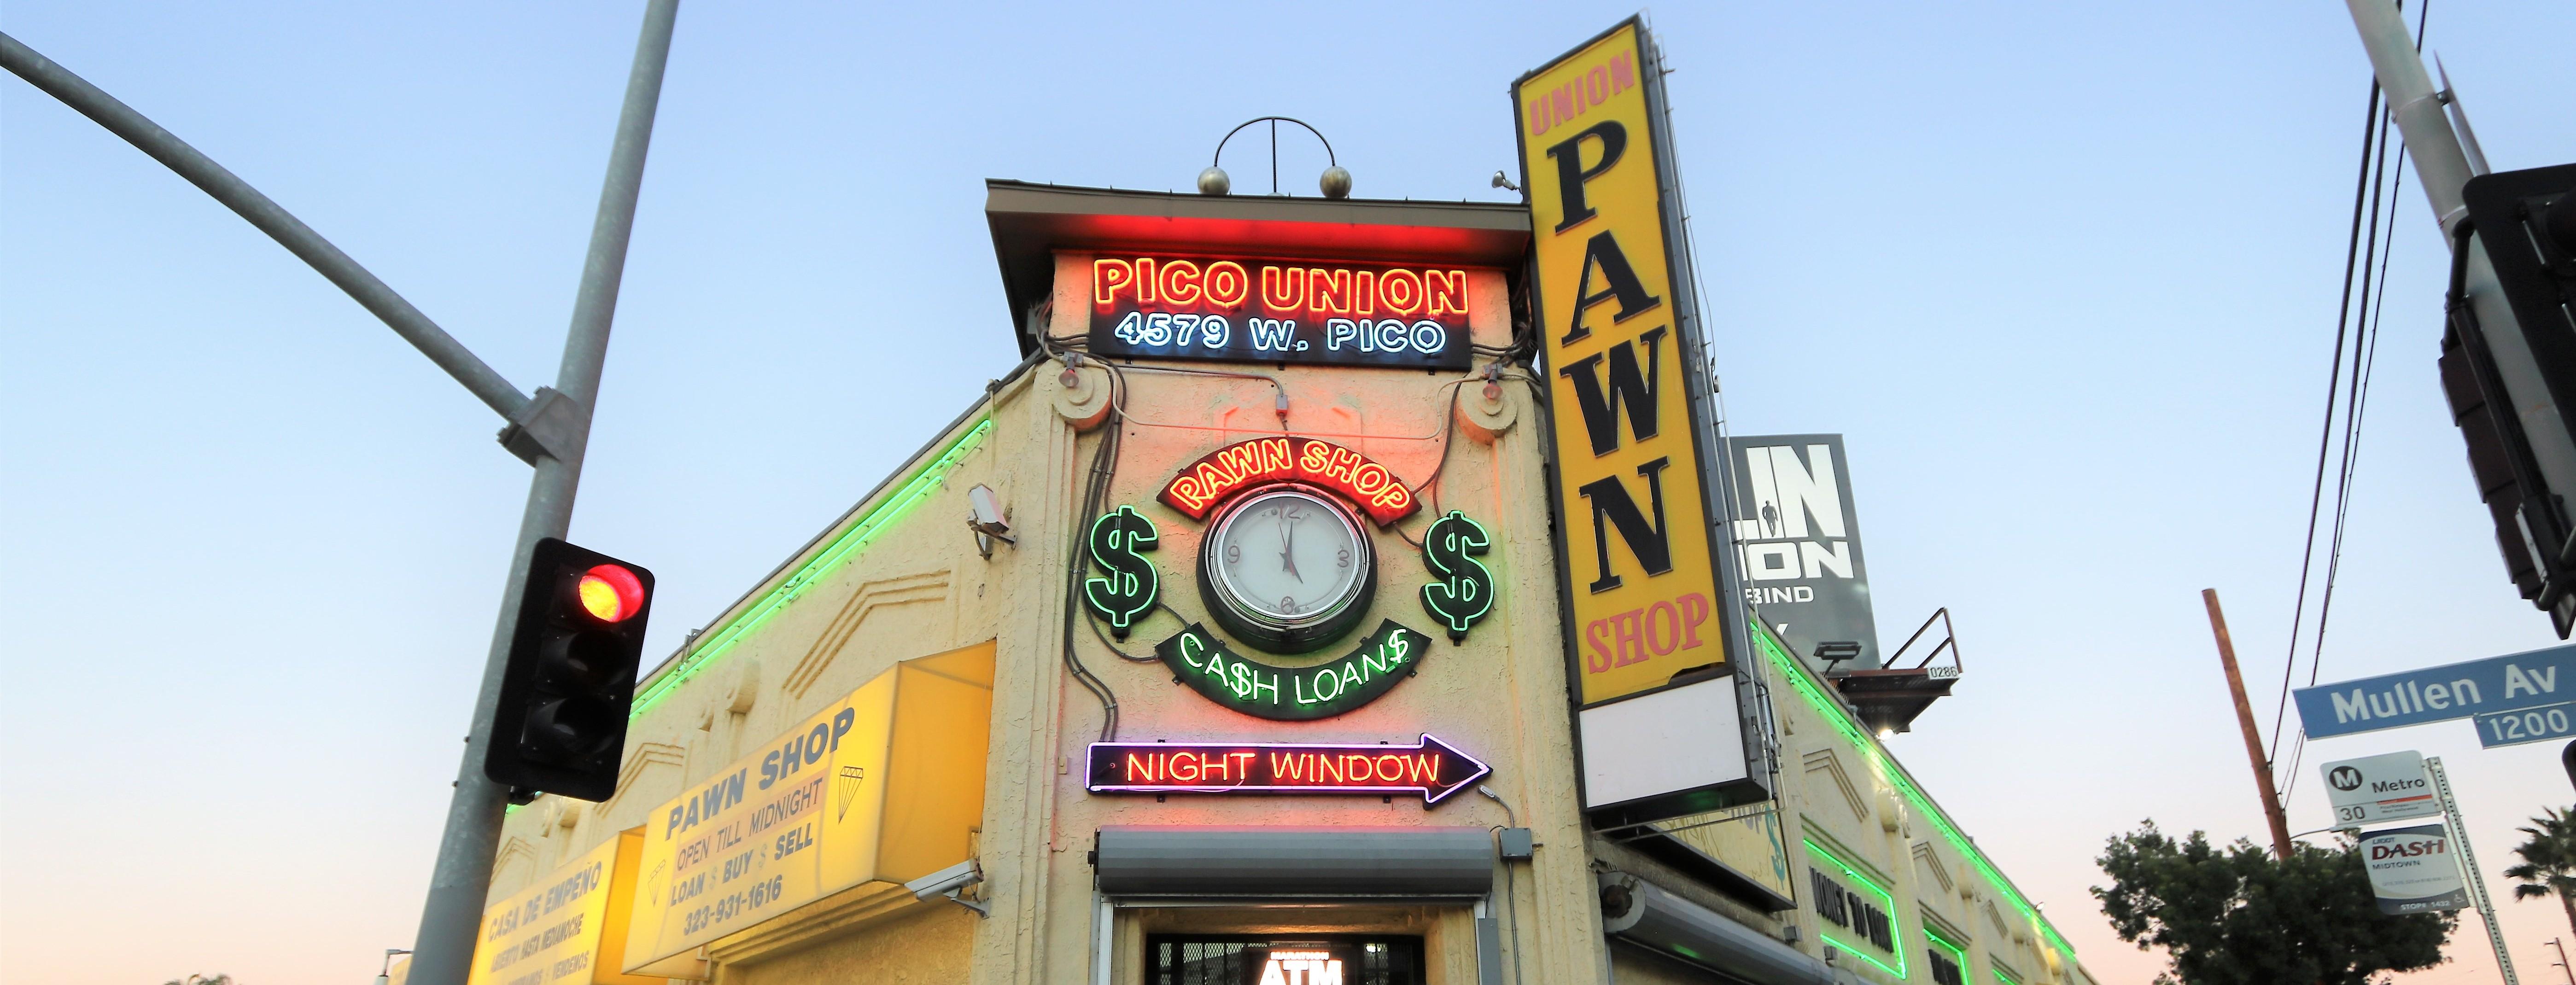 Pico Union Pawn Shop